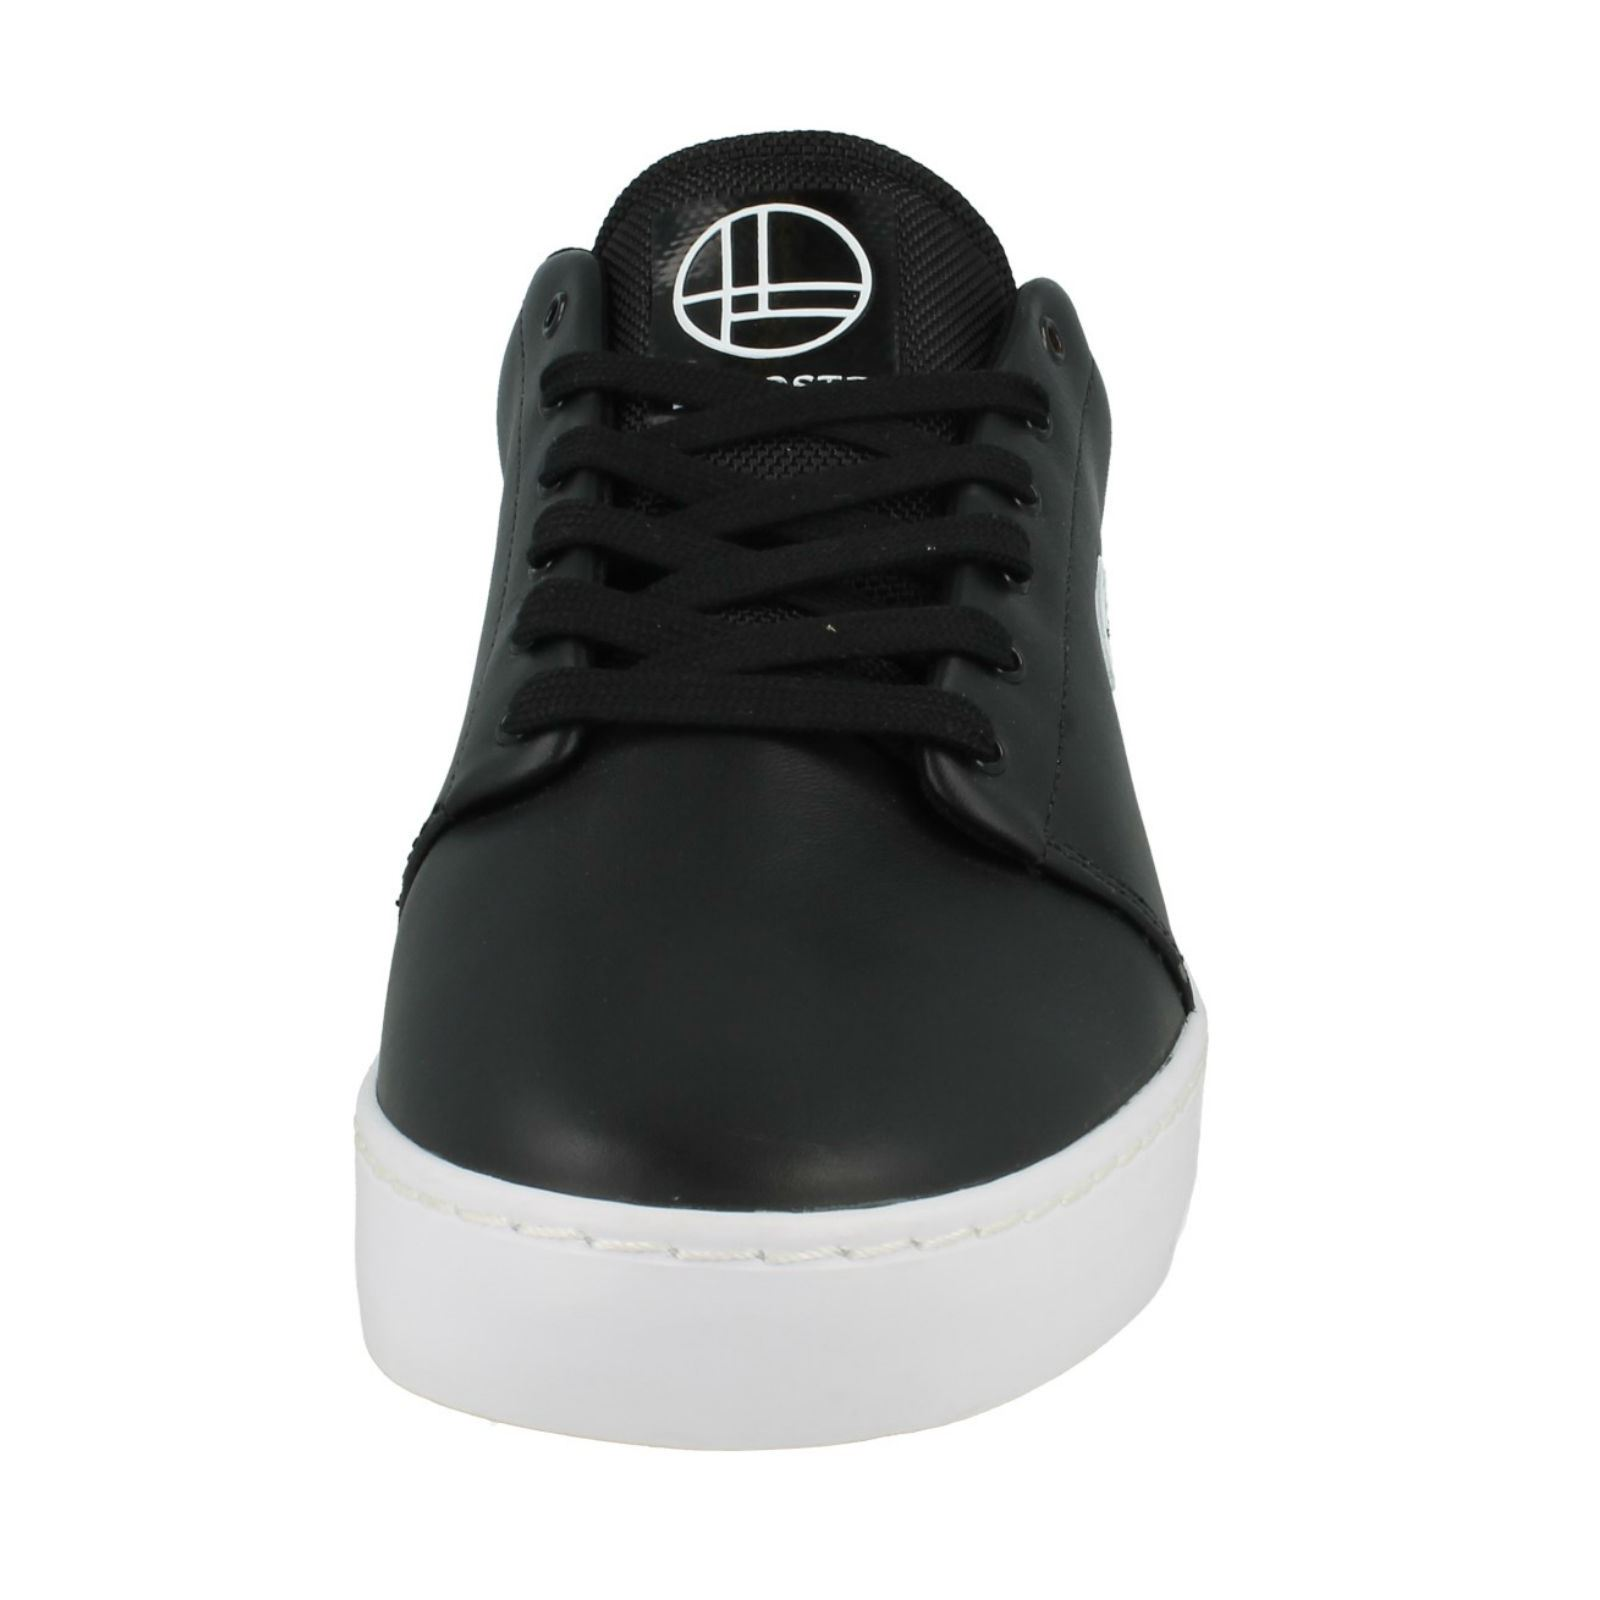 Herren Lacoste FLX Trainers Label - Court Legacy FLX Lacoste SPM f9ec3e